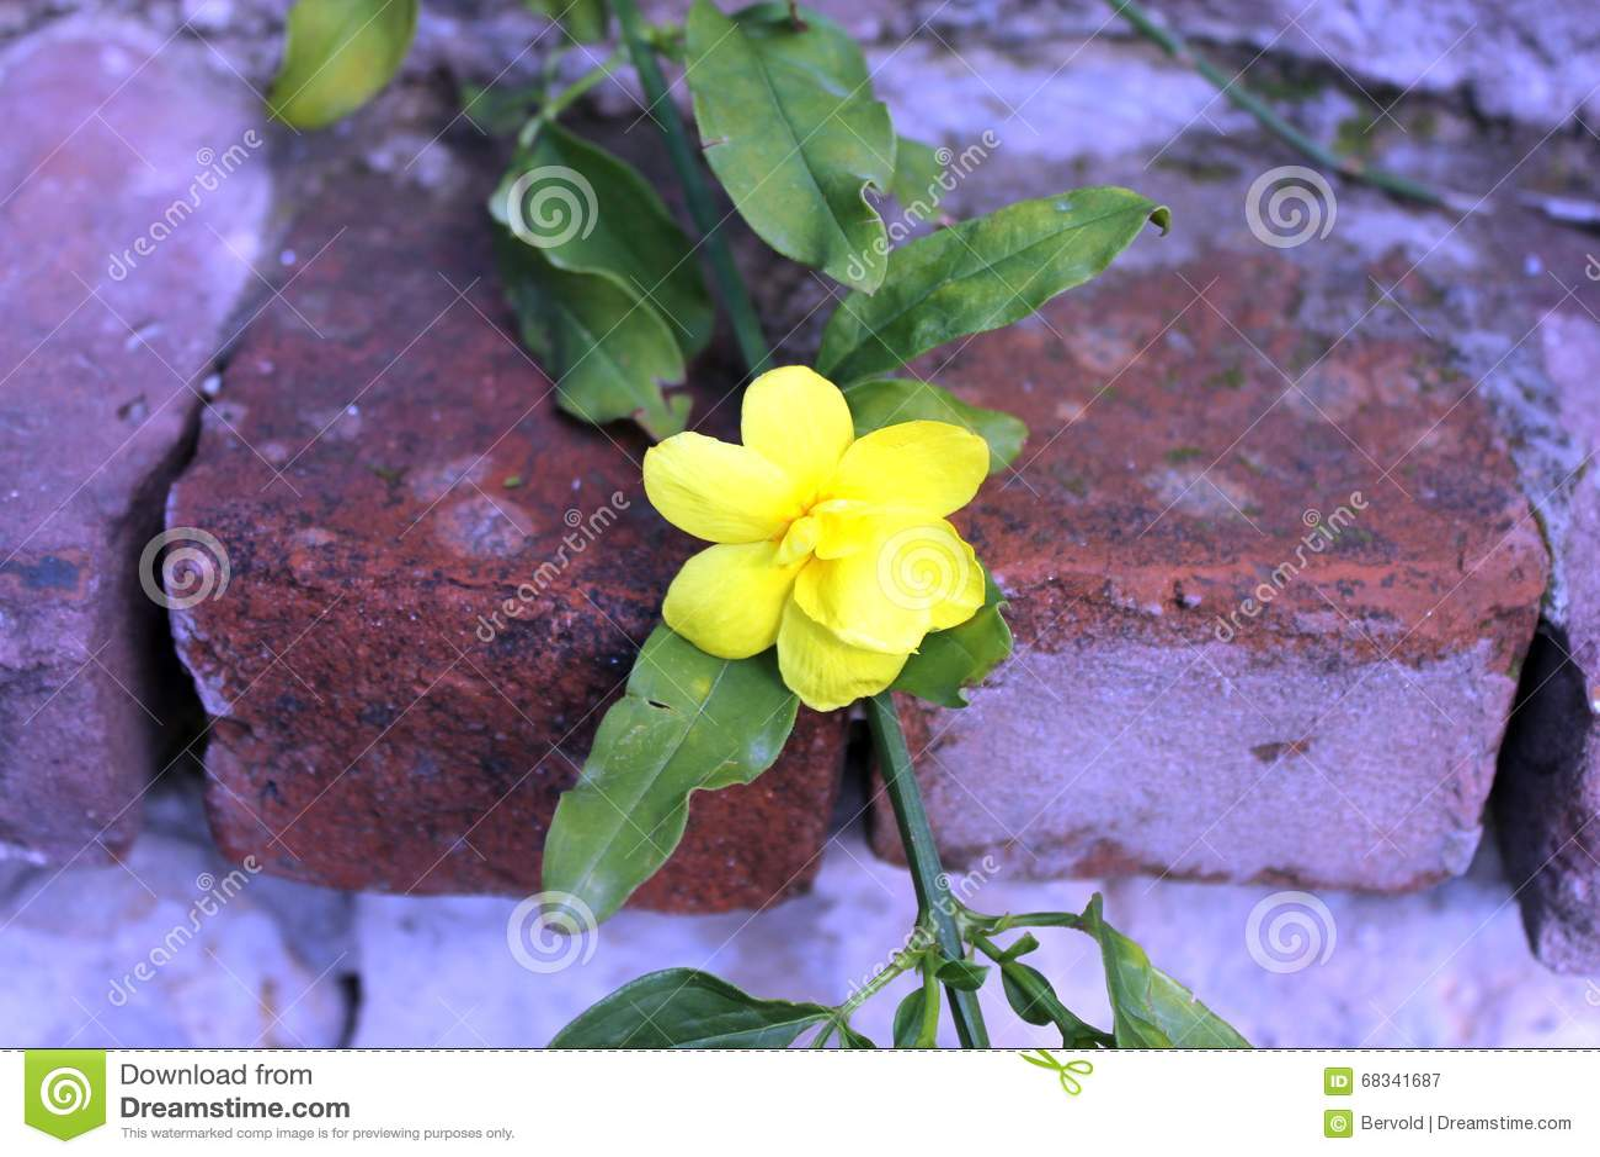 Yellow Jasmine Gelsemium Sempervirens Flowers Stock Image Image Of